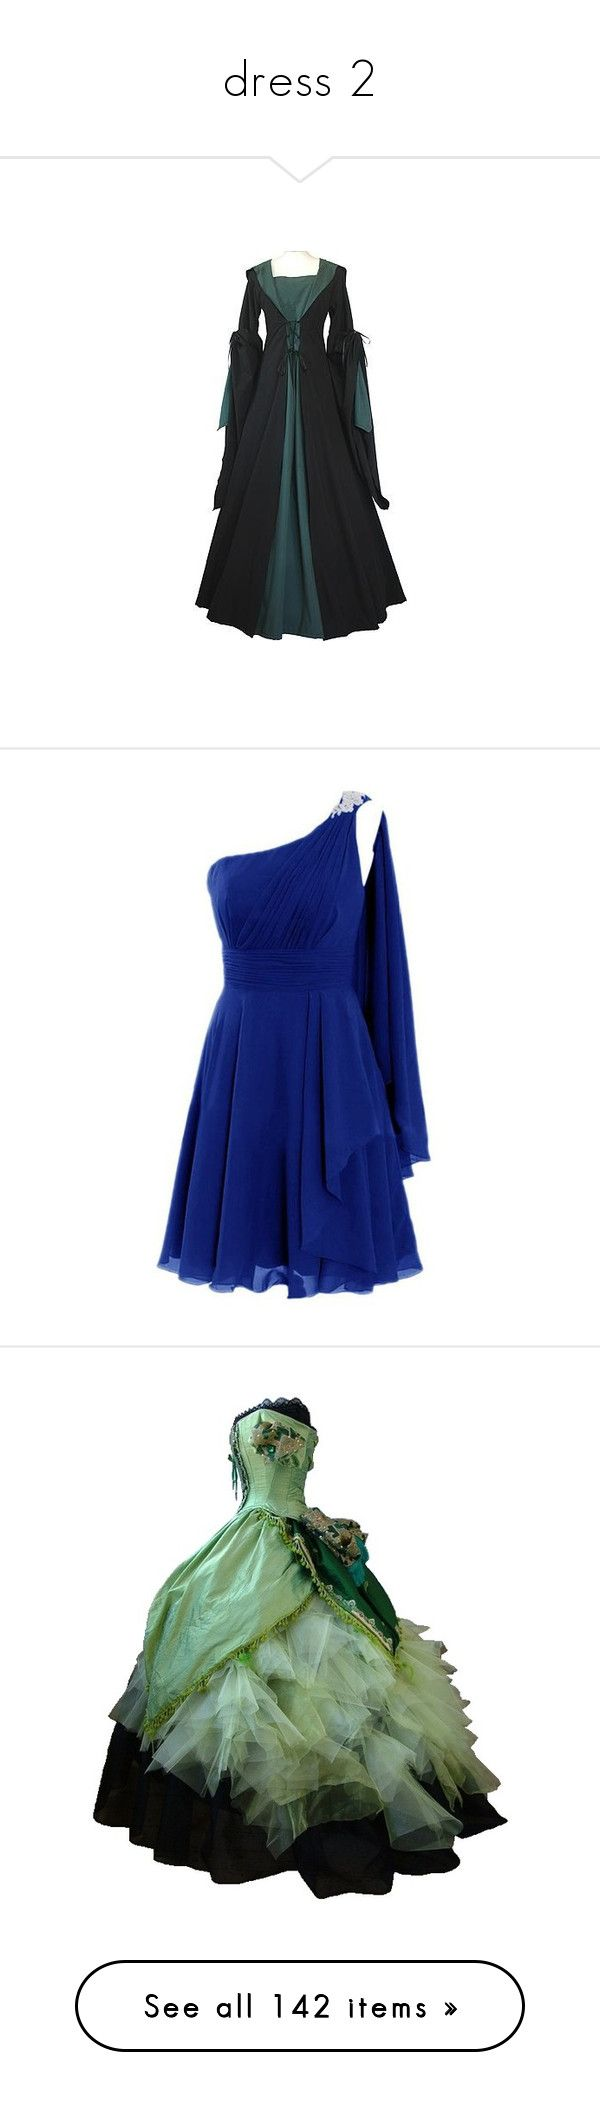 """dress 2"" by waylon-gluskin on Polyvore featuring dresses, slytherin, harry potter, short dresses, vestidos, short bridesmaid dresses, chiffon bridesmaid dresses, prom dresses, one shoulder cocktail dress and one shoulder bridesmaid dresses"